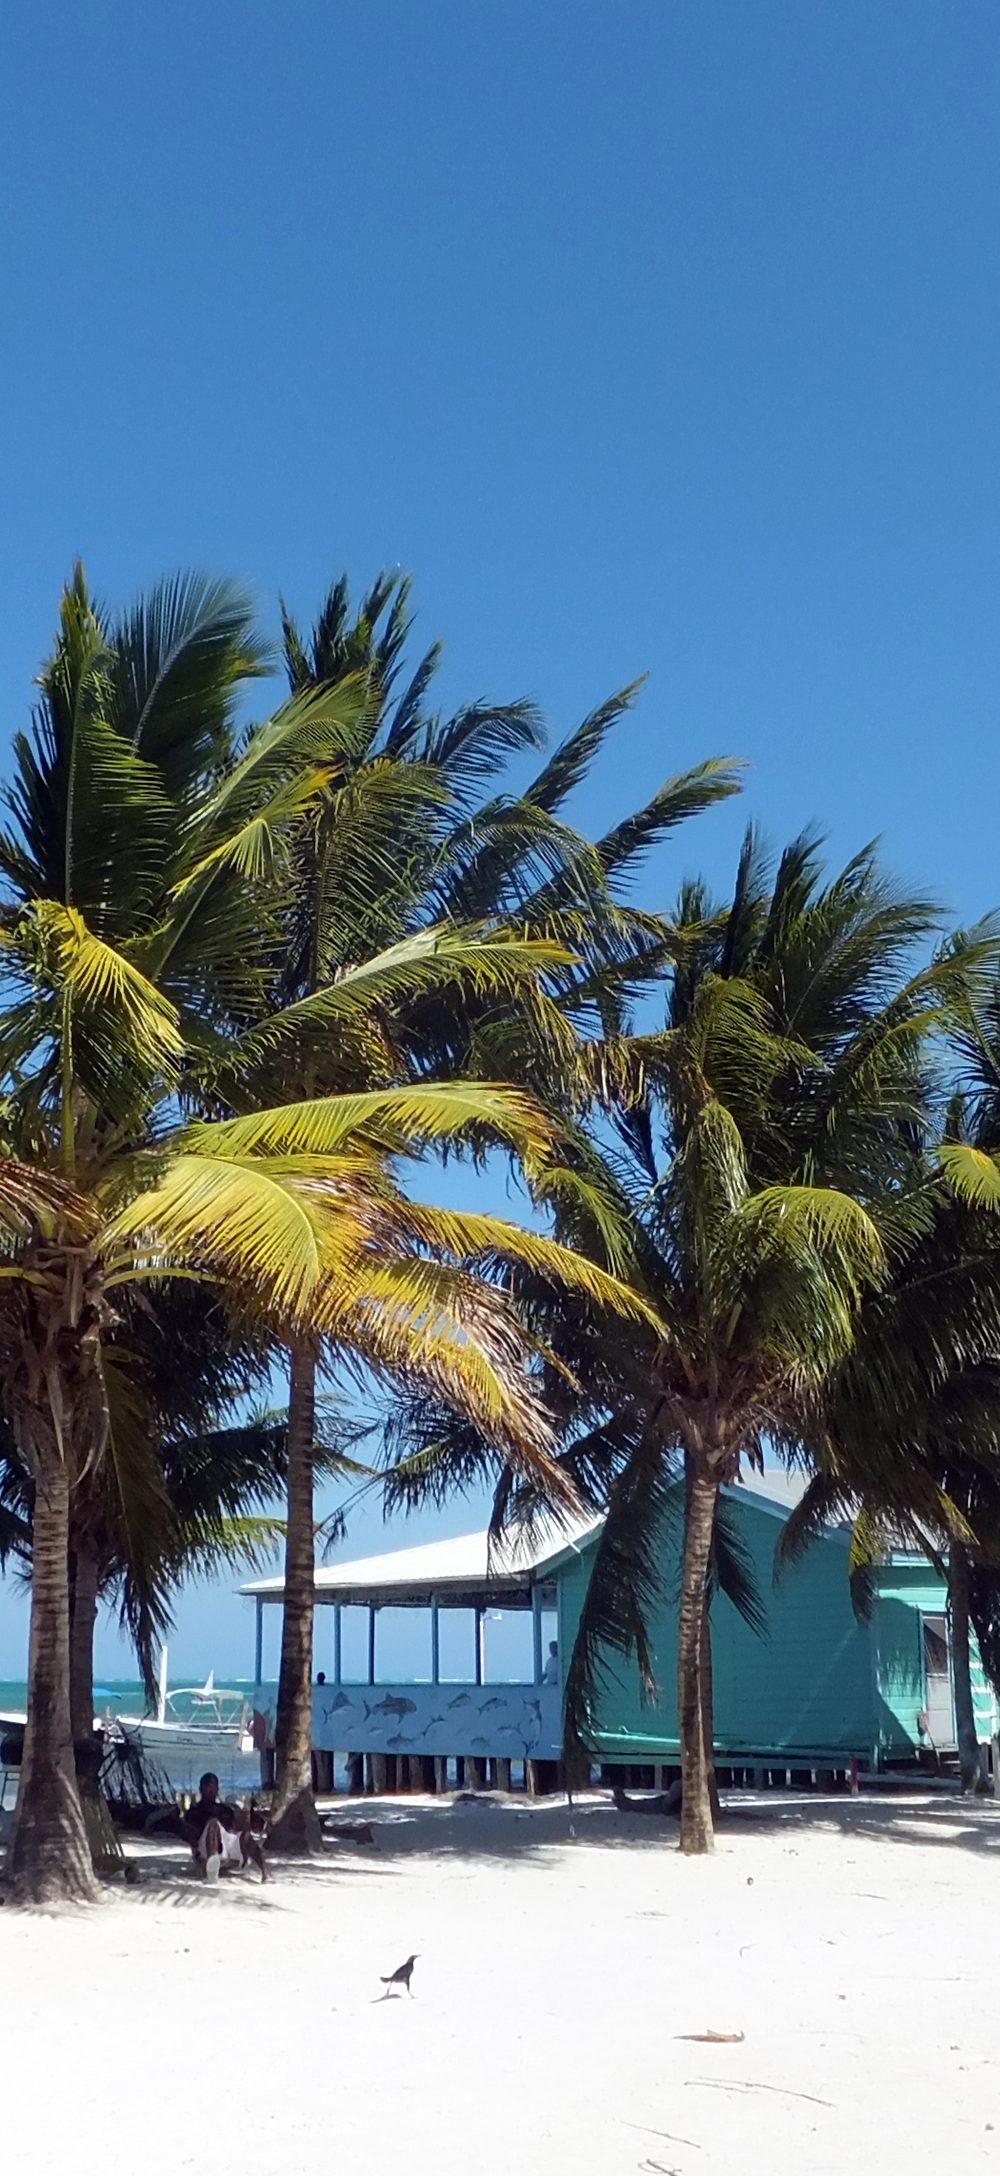 A Photo Blog of Belize